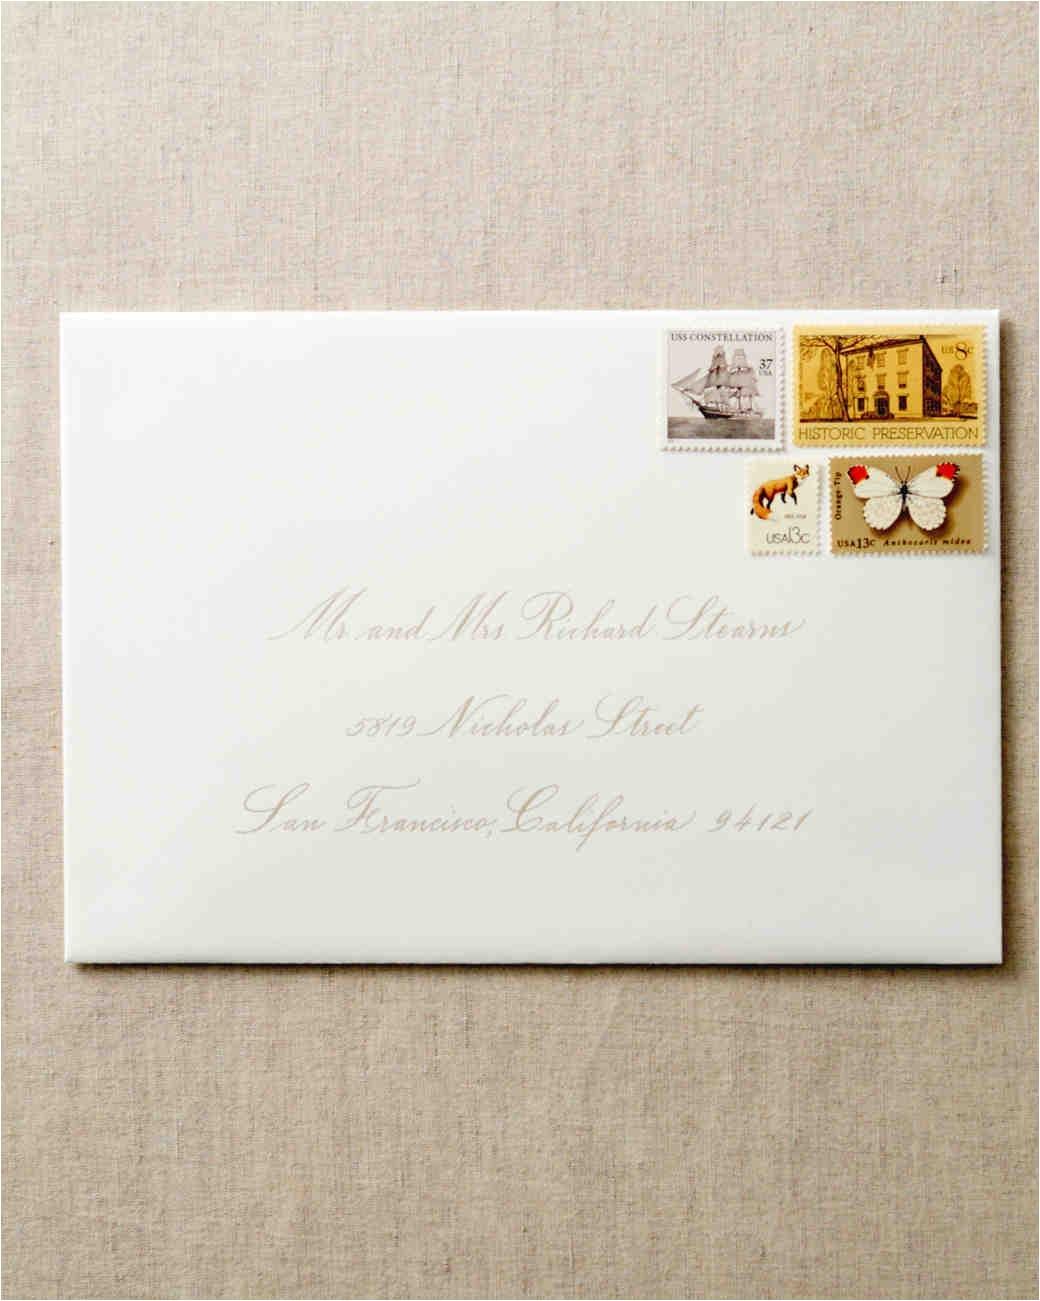 proper way to address wedding invitations new how to address guests on wedding invitation envelopes martha